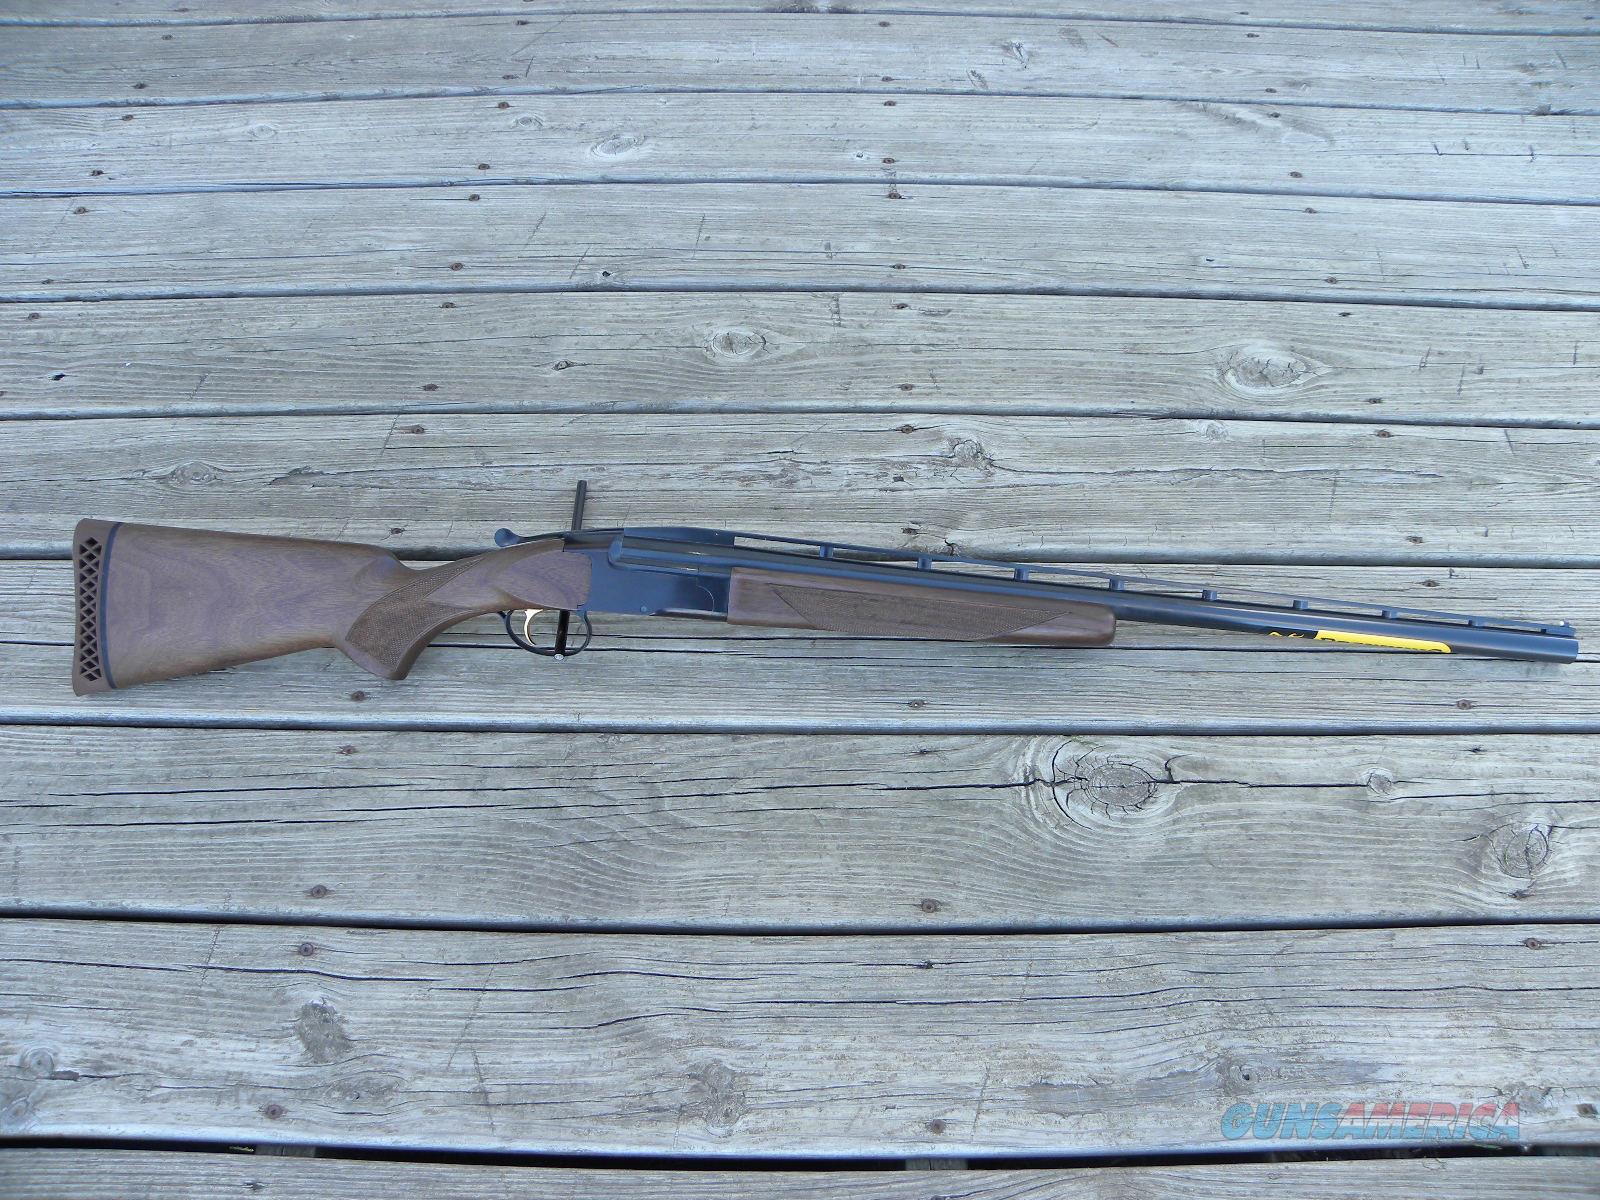 NIB Browning BT-99 Micro Midas 12/28 017075404  Guns > Shotguns > Browning Shotguns > Single Barrel